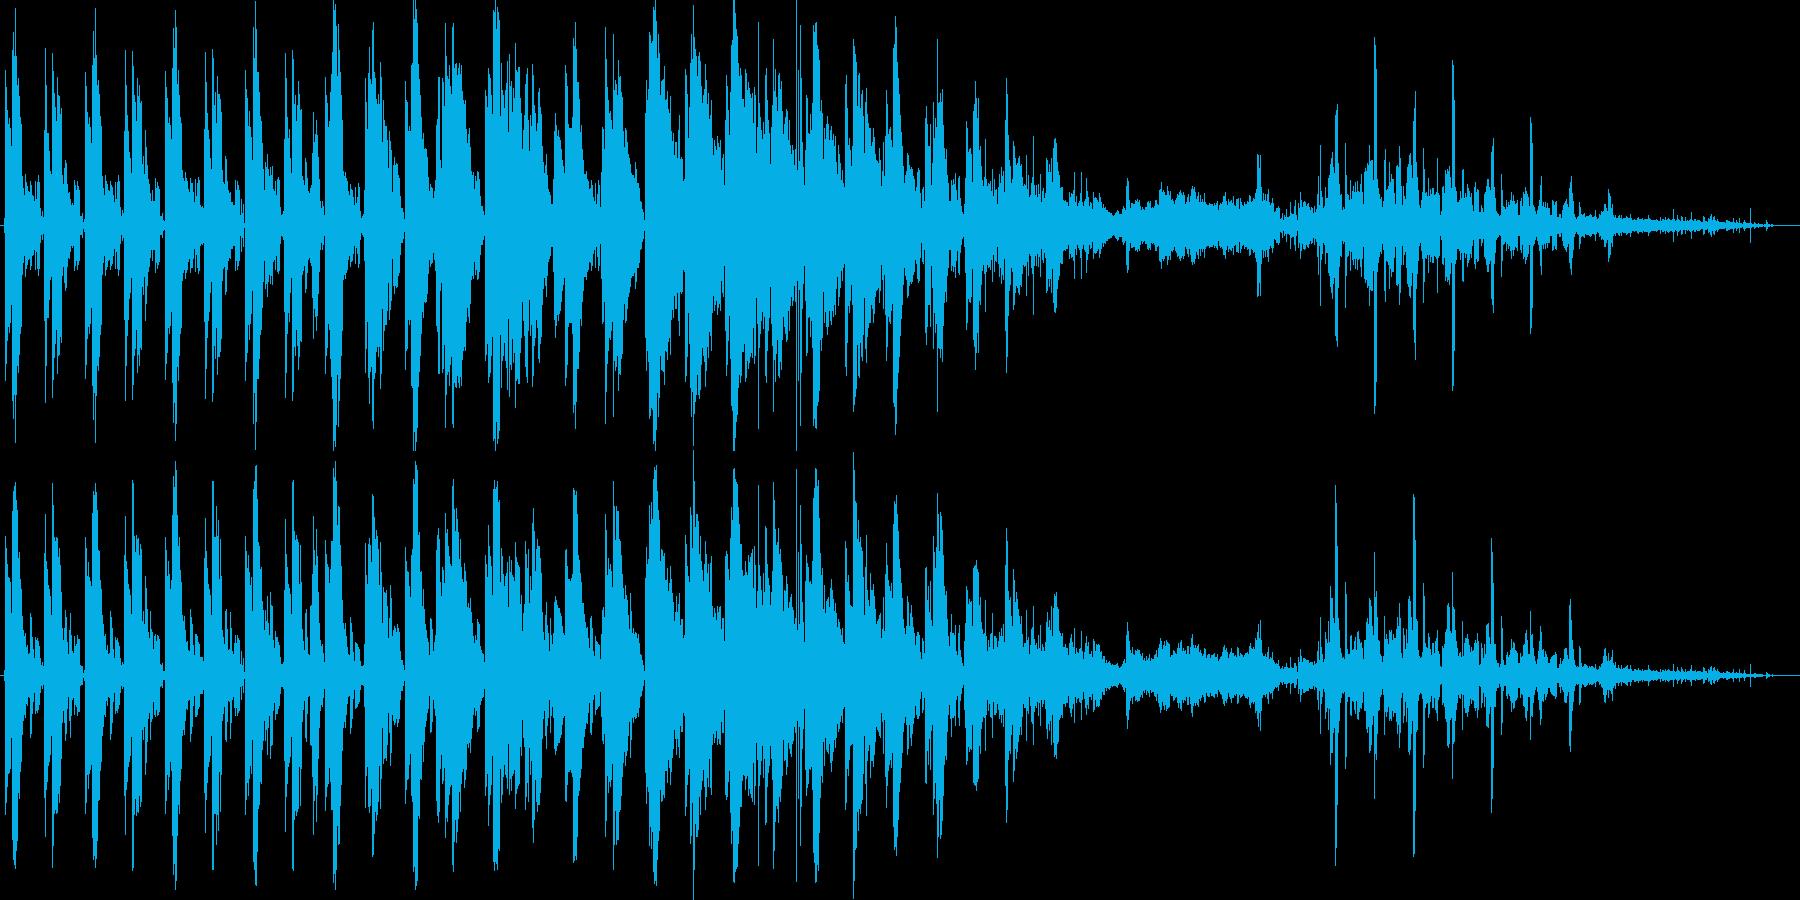 MILESの再生済みの波形